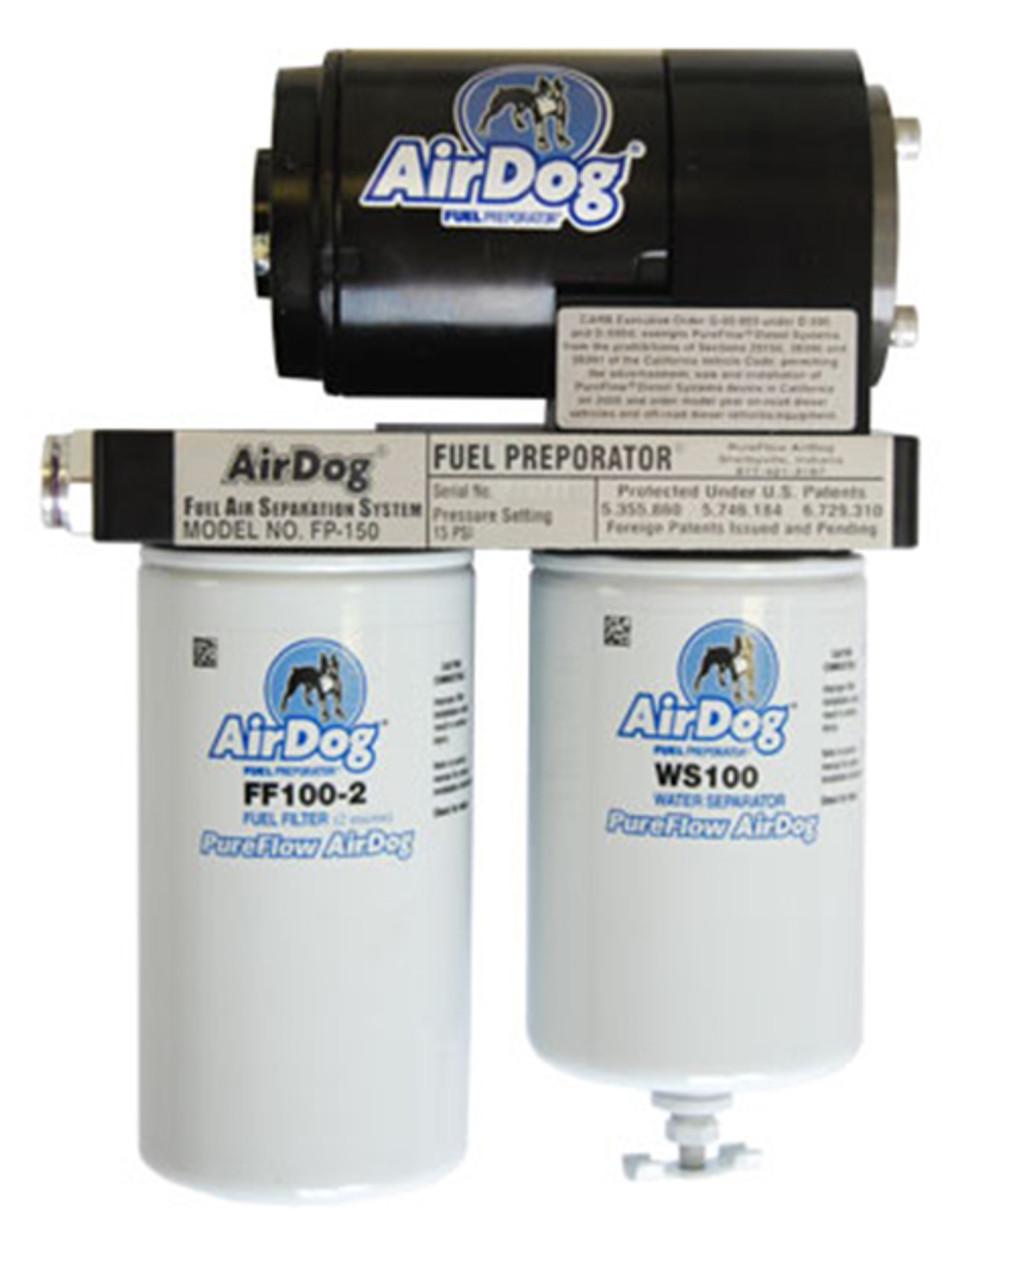 Pureflow/Airdog 2001-2009 Chevy Duramax AirDog 100 Preset - Quick Disconnect